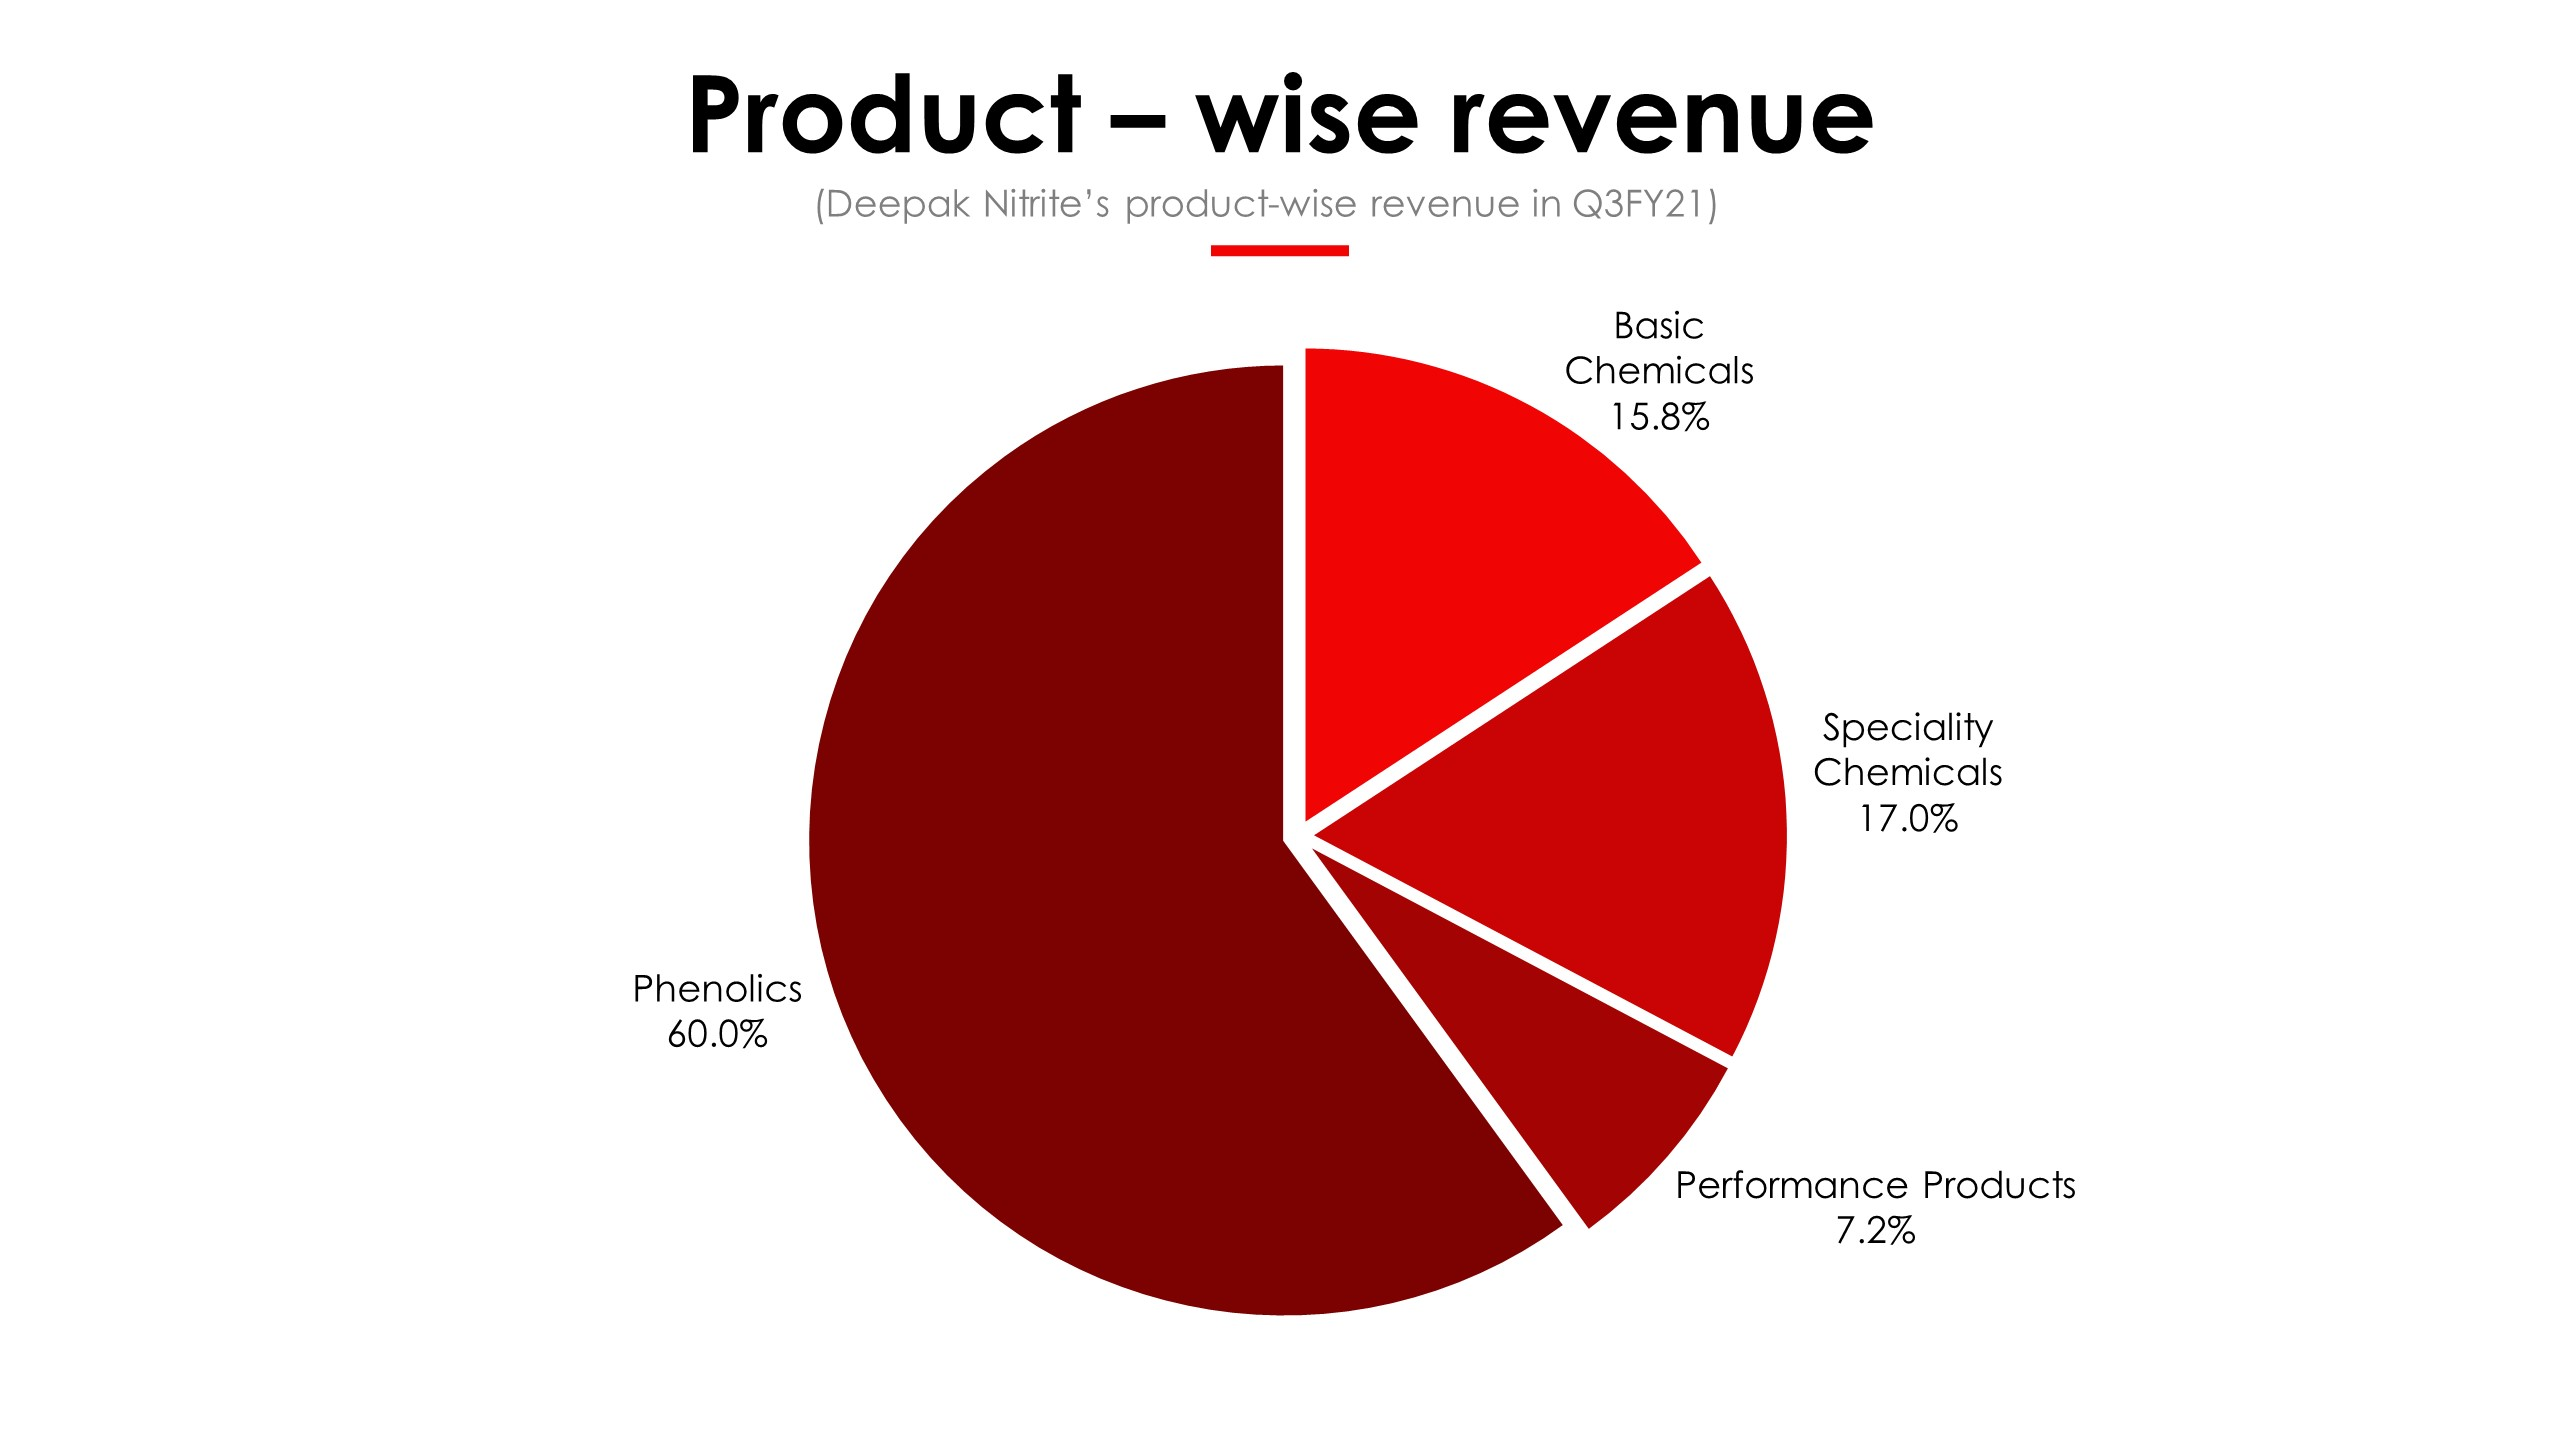 Deepak Nitrite Product Revenue